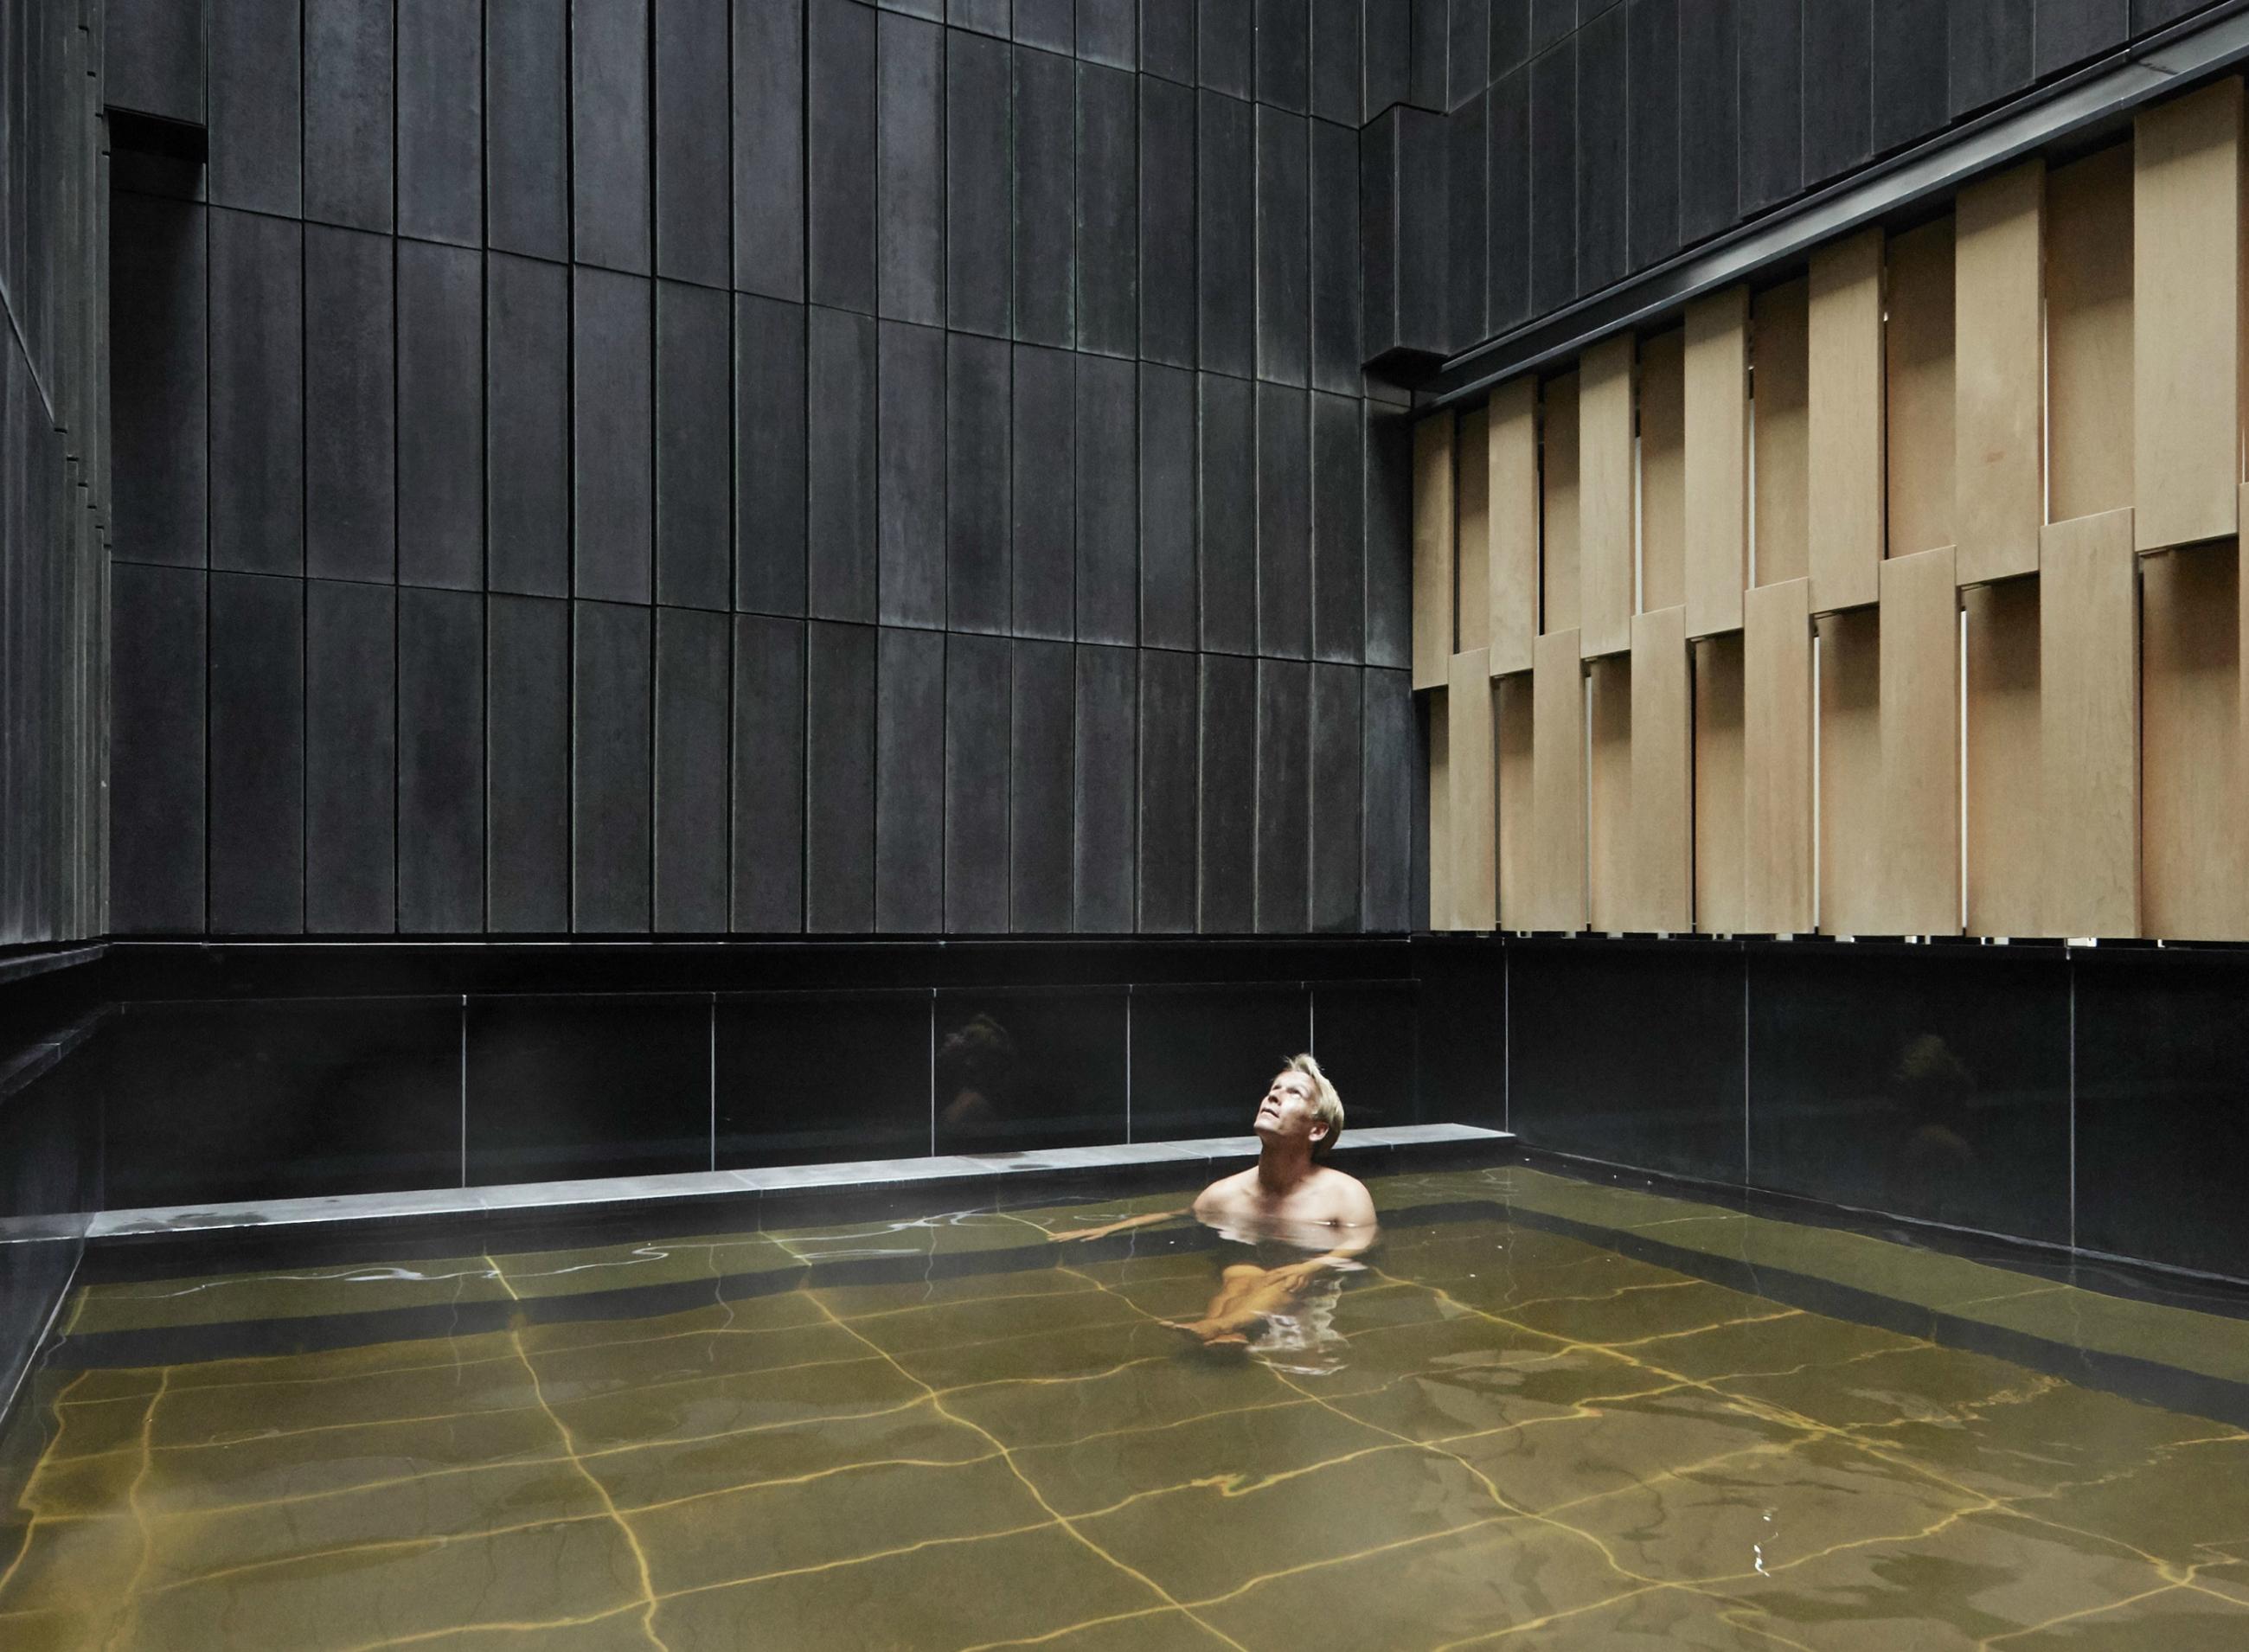 Hoshinoya onsen bath